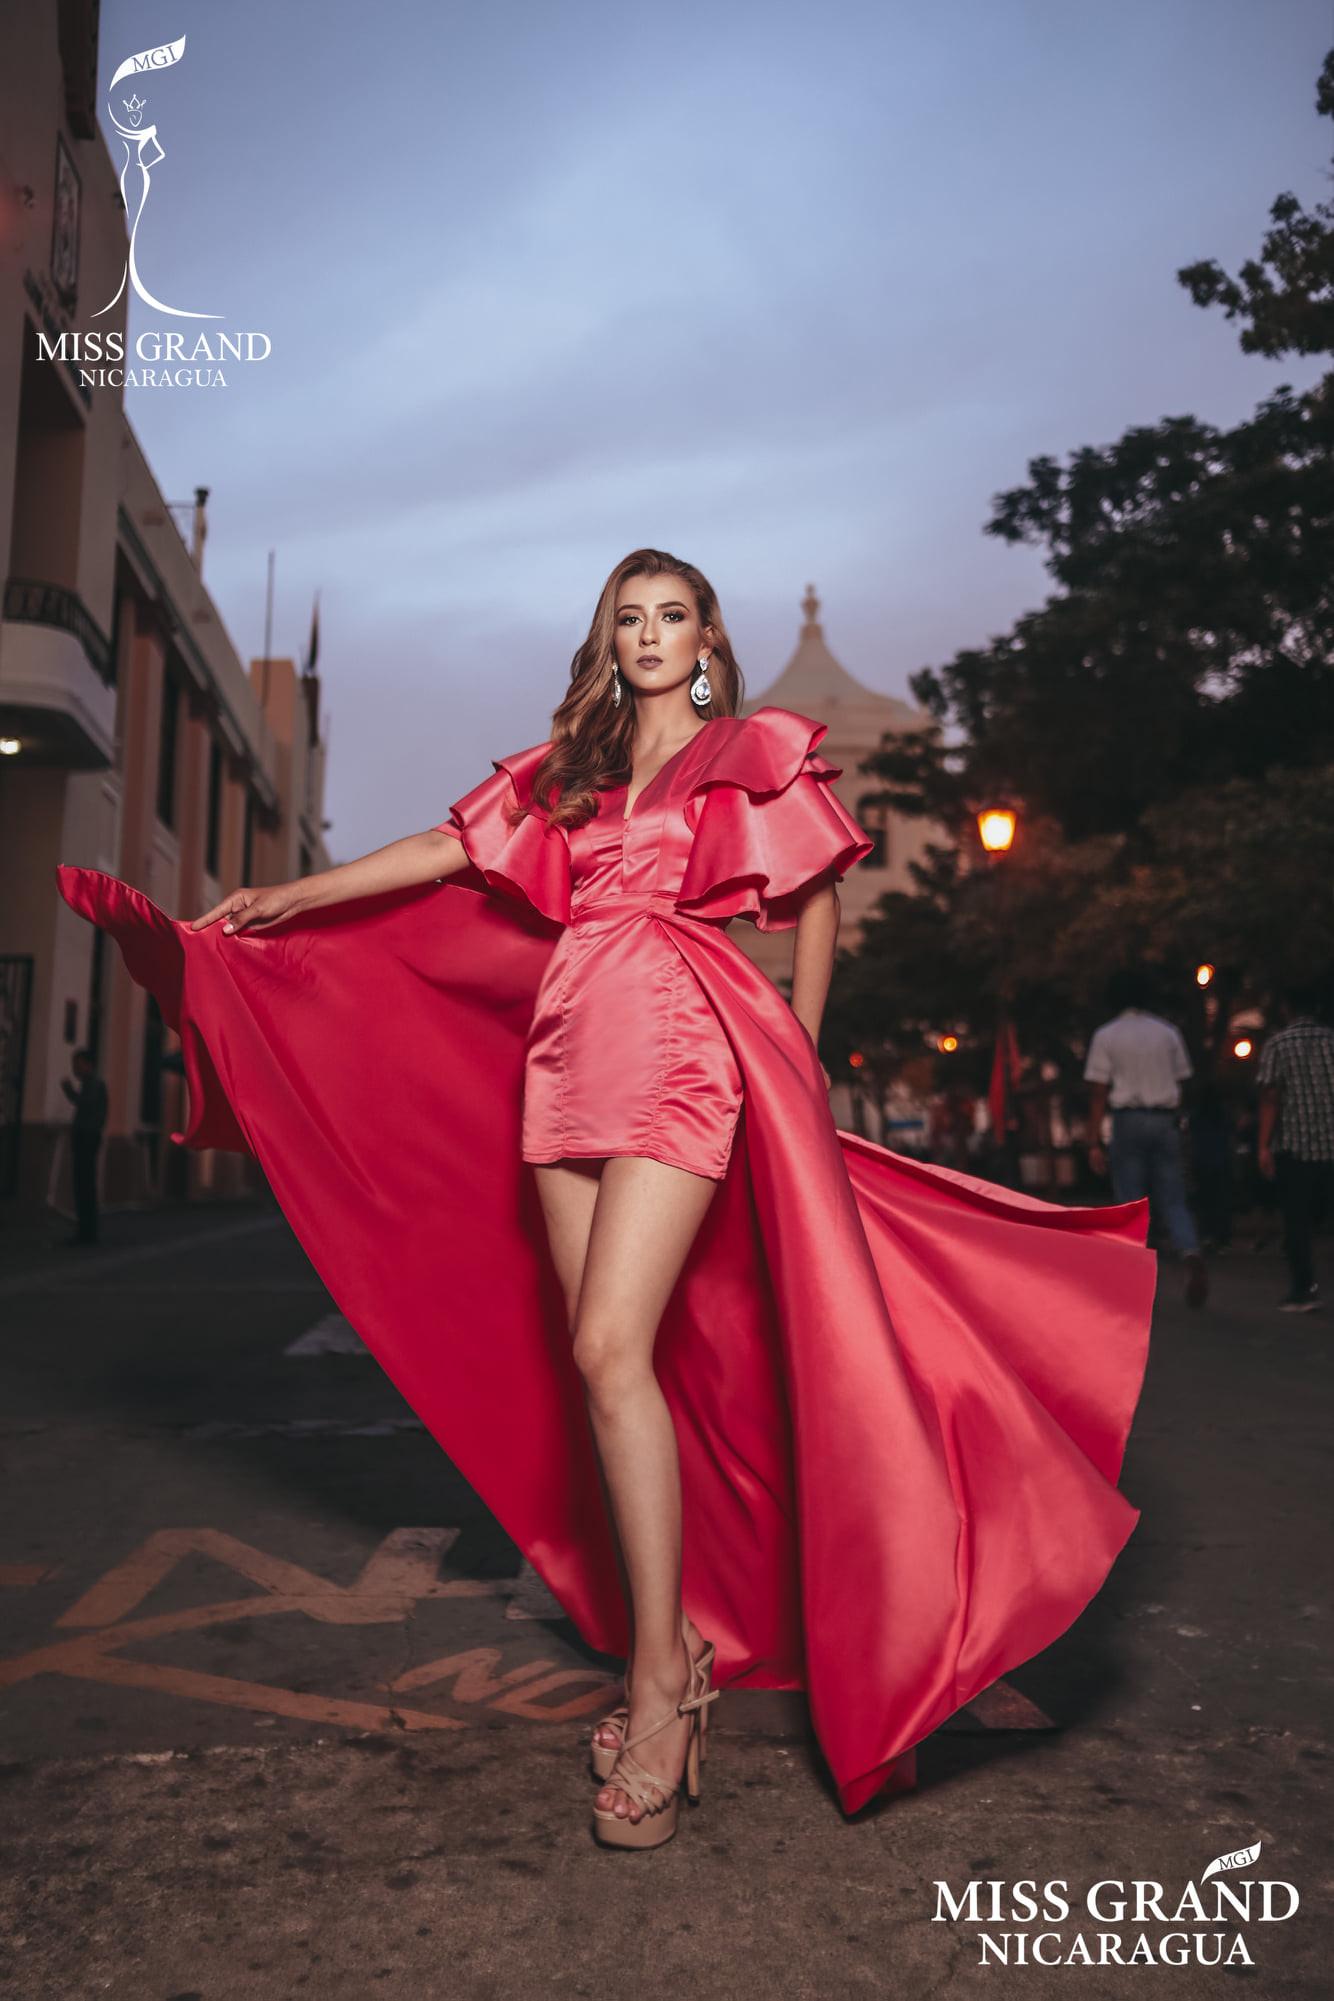 candidatas a miss grand nicaragua 2021. final: 31 july. - Página 2 O5TjJS